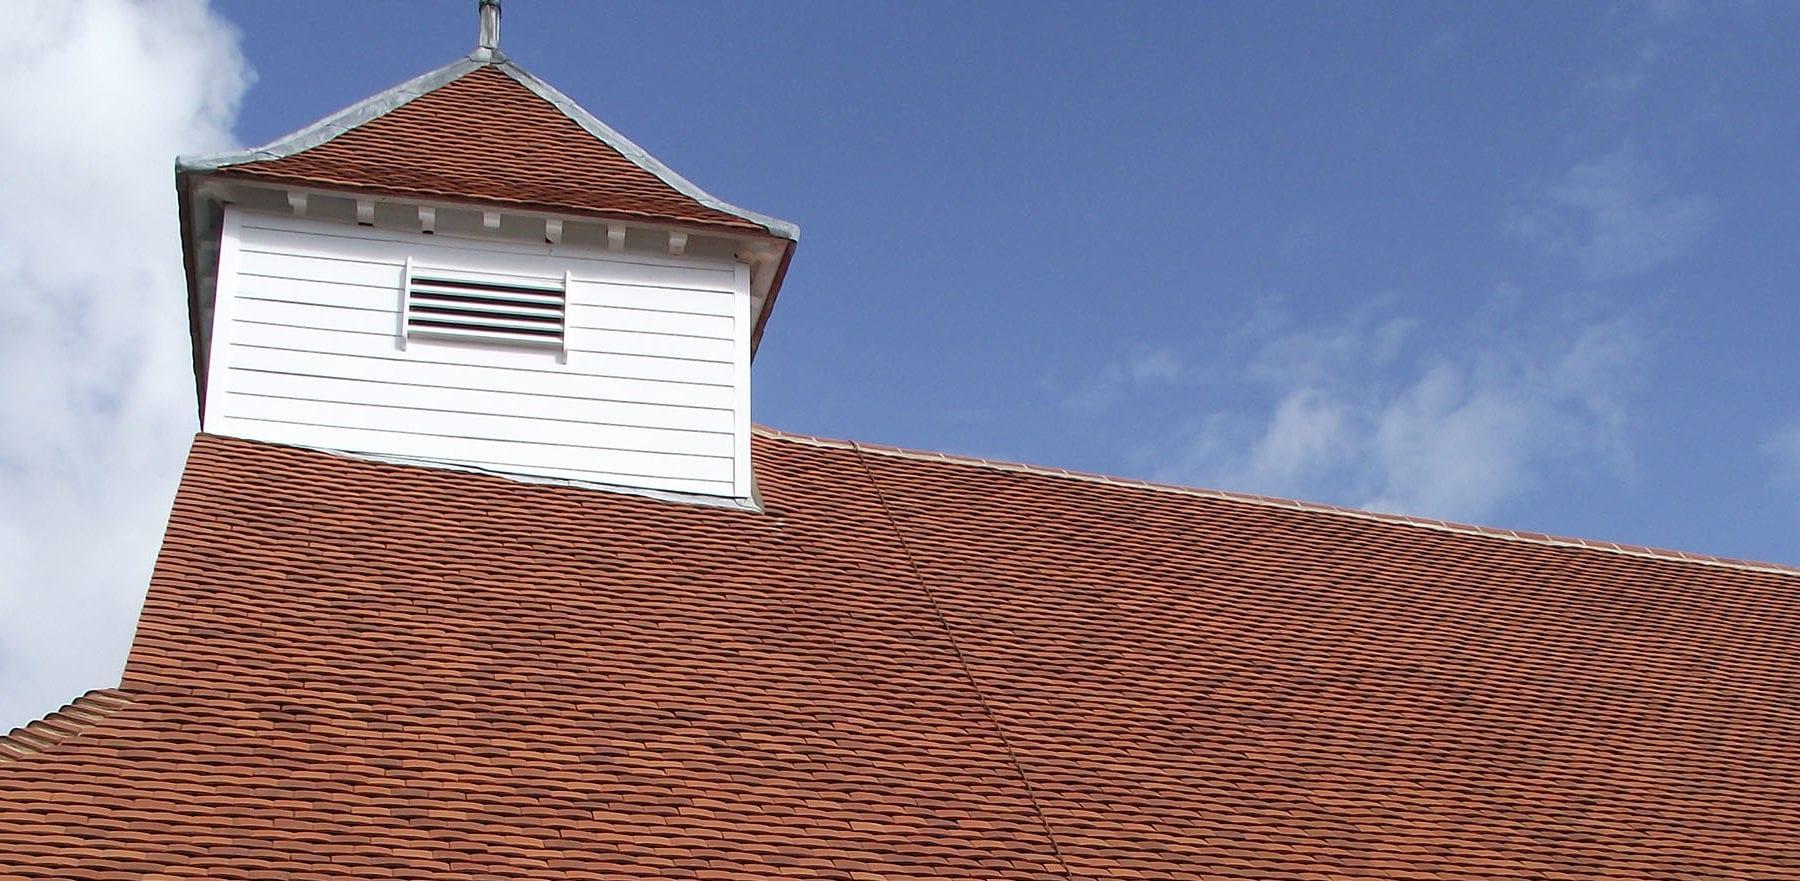 Lifestiles - Handmade Orange Clay Roof Tiles - Sulhampstead Abbot, England 4